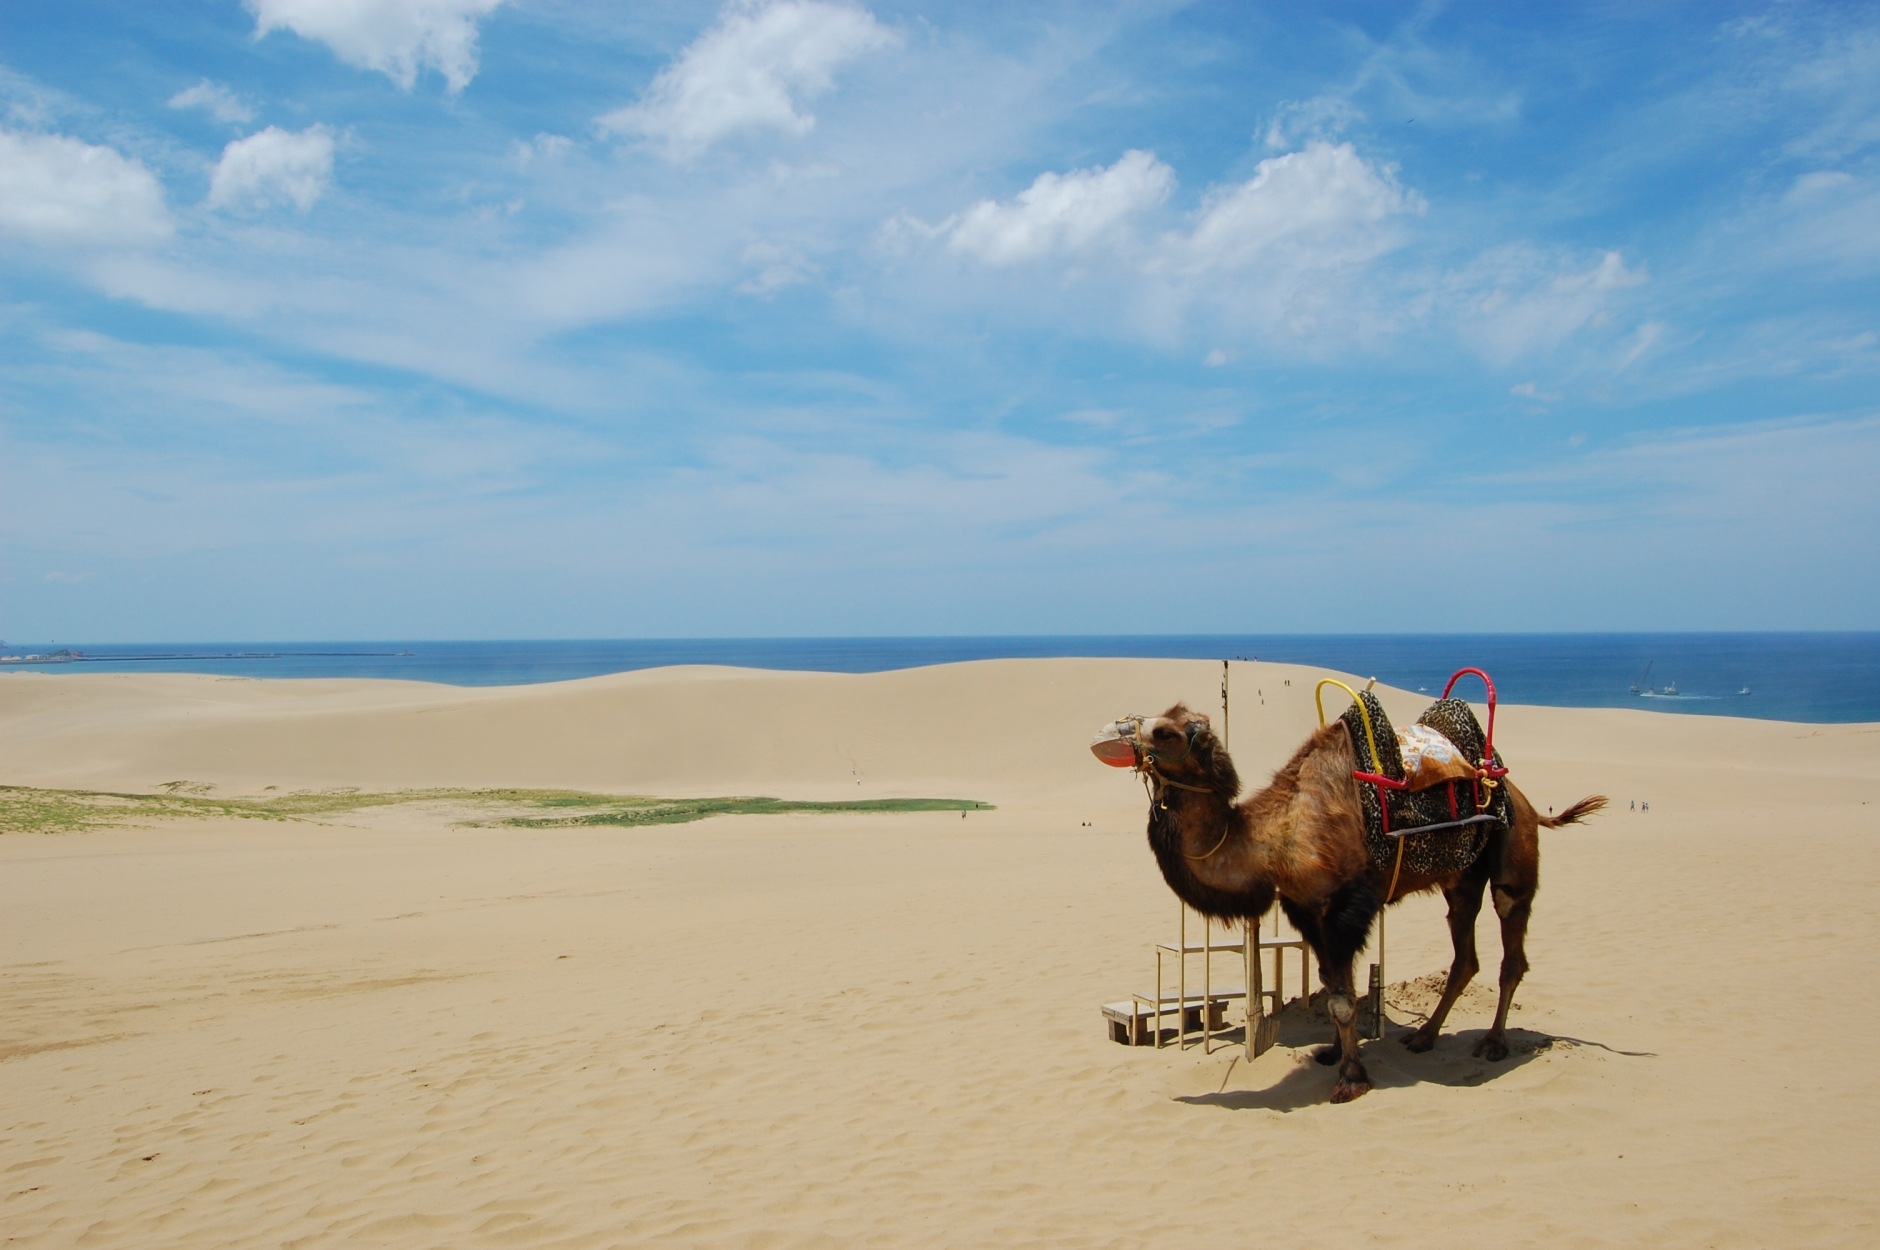 Tottori Japan  city photo : ... の車庫: Tottori Sand Dunes : The Largest Desert in Japan